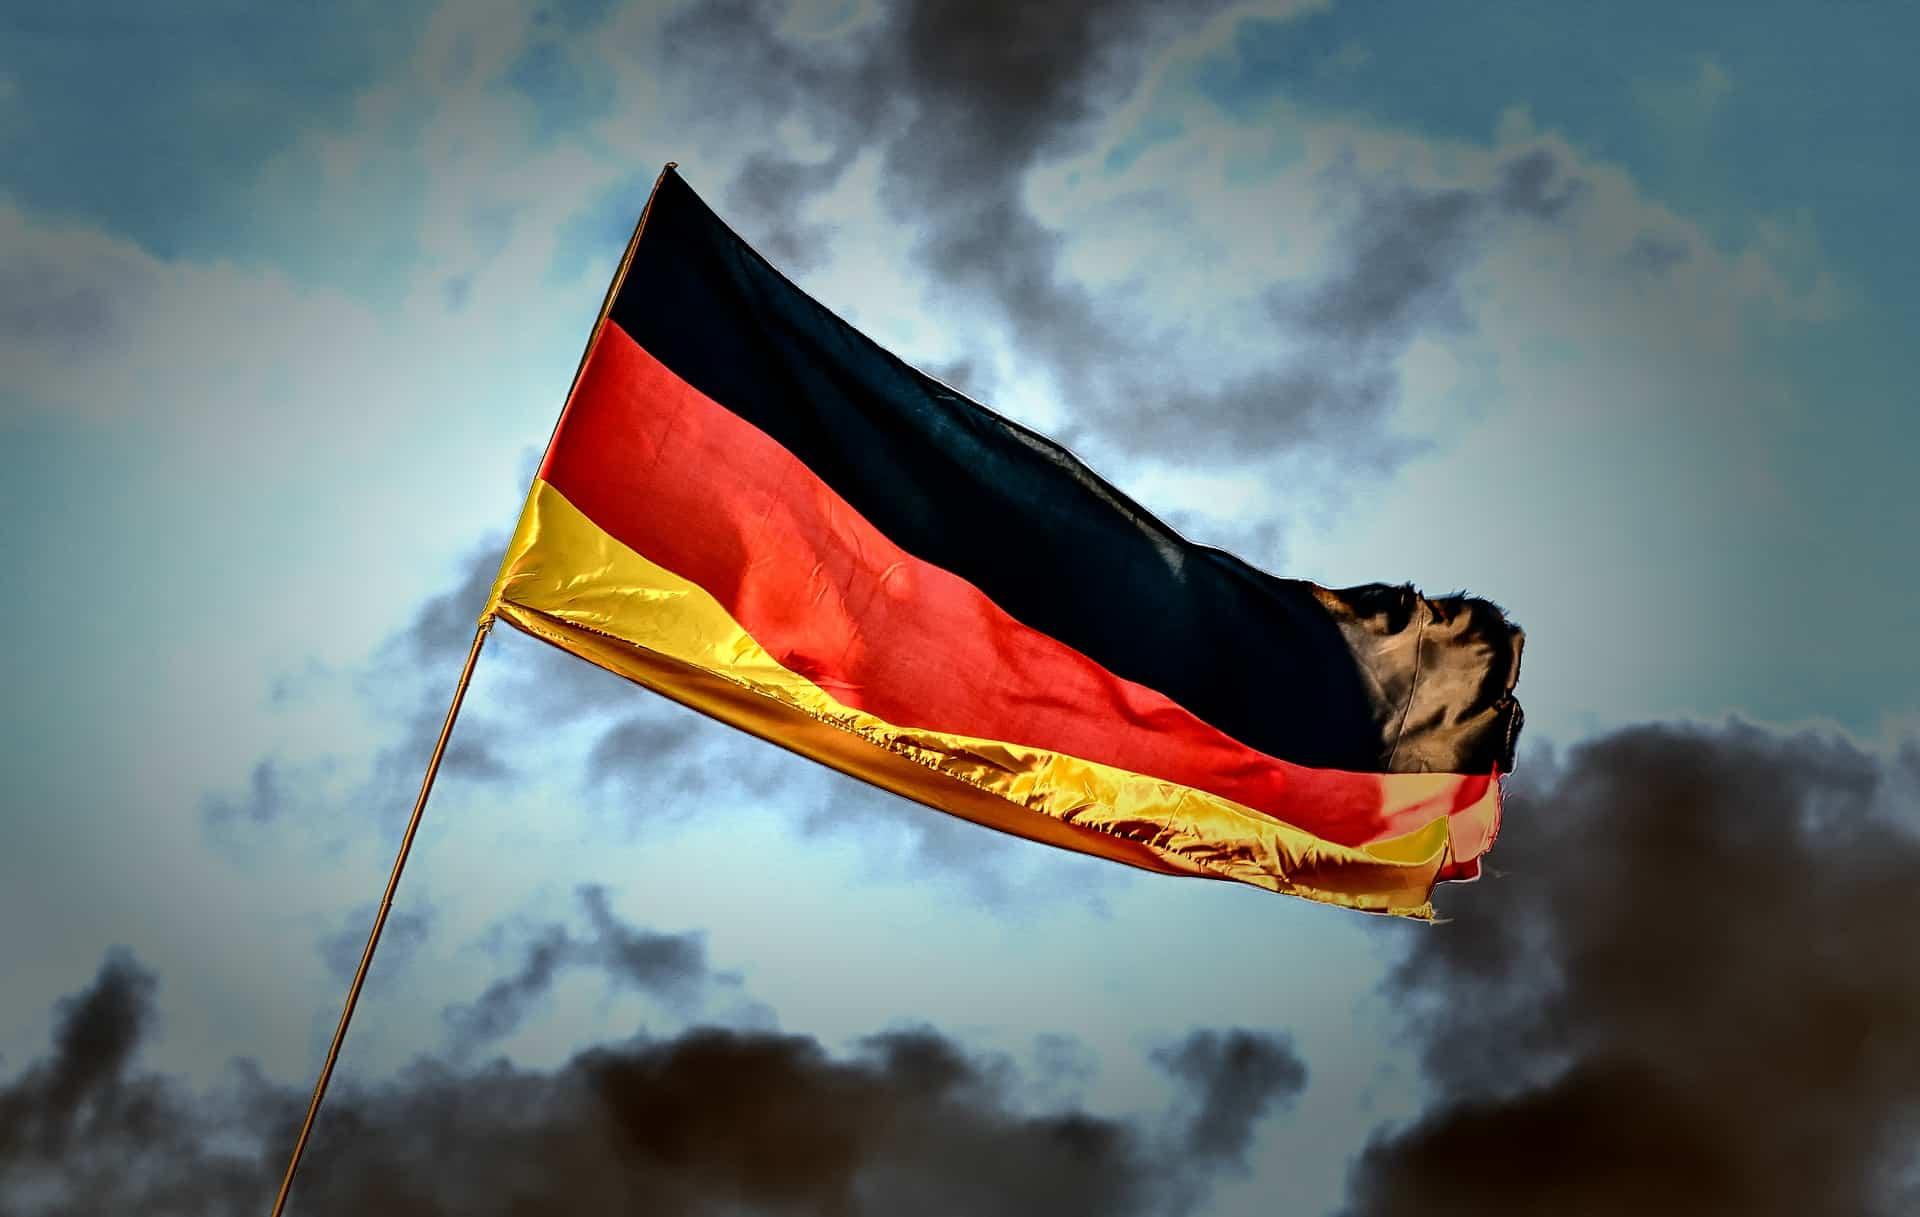 Tansporte terrestre con Alemania